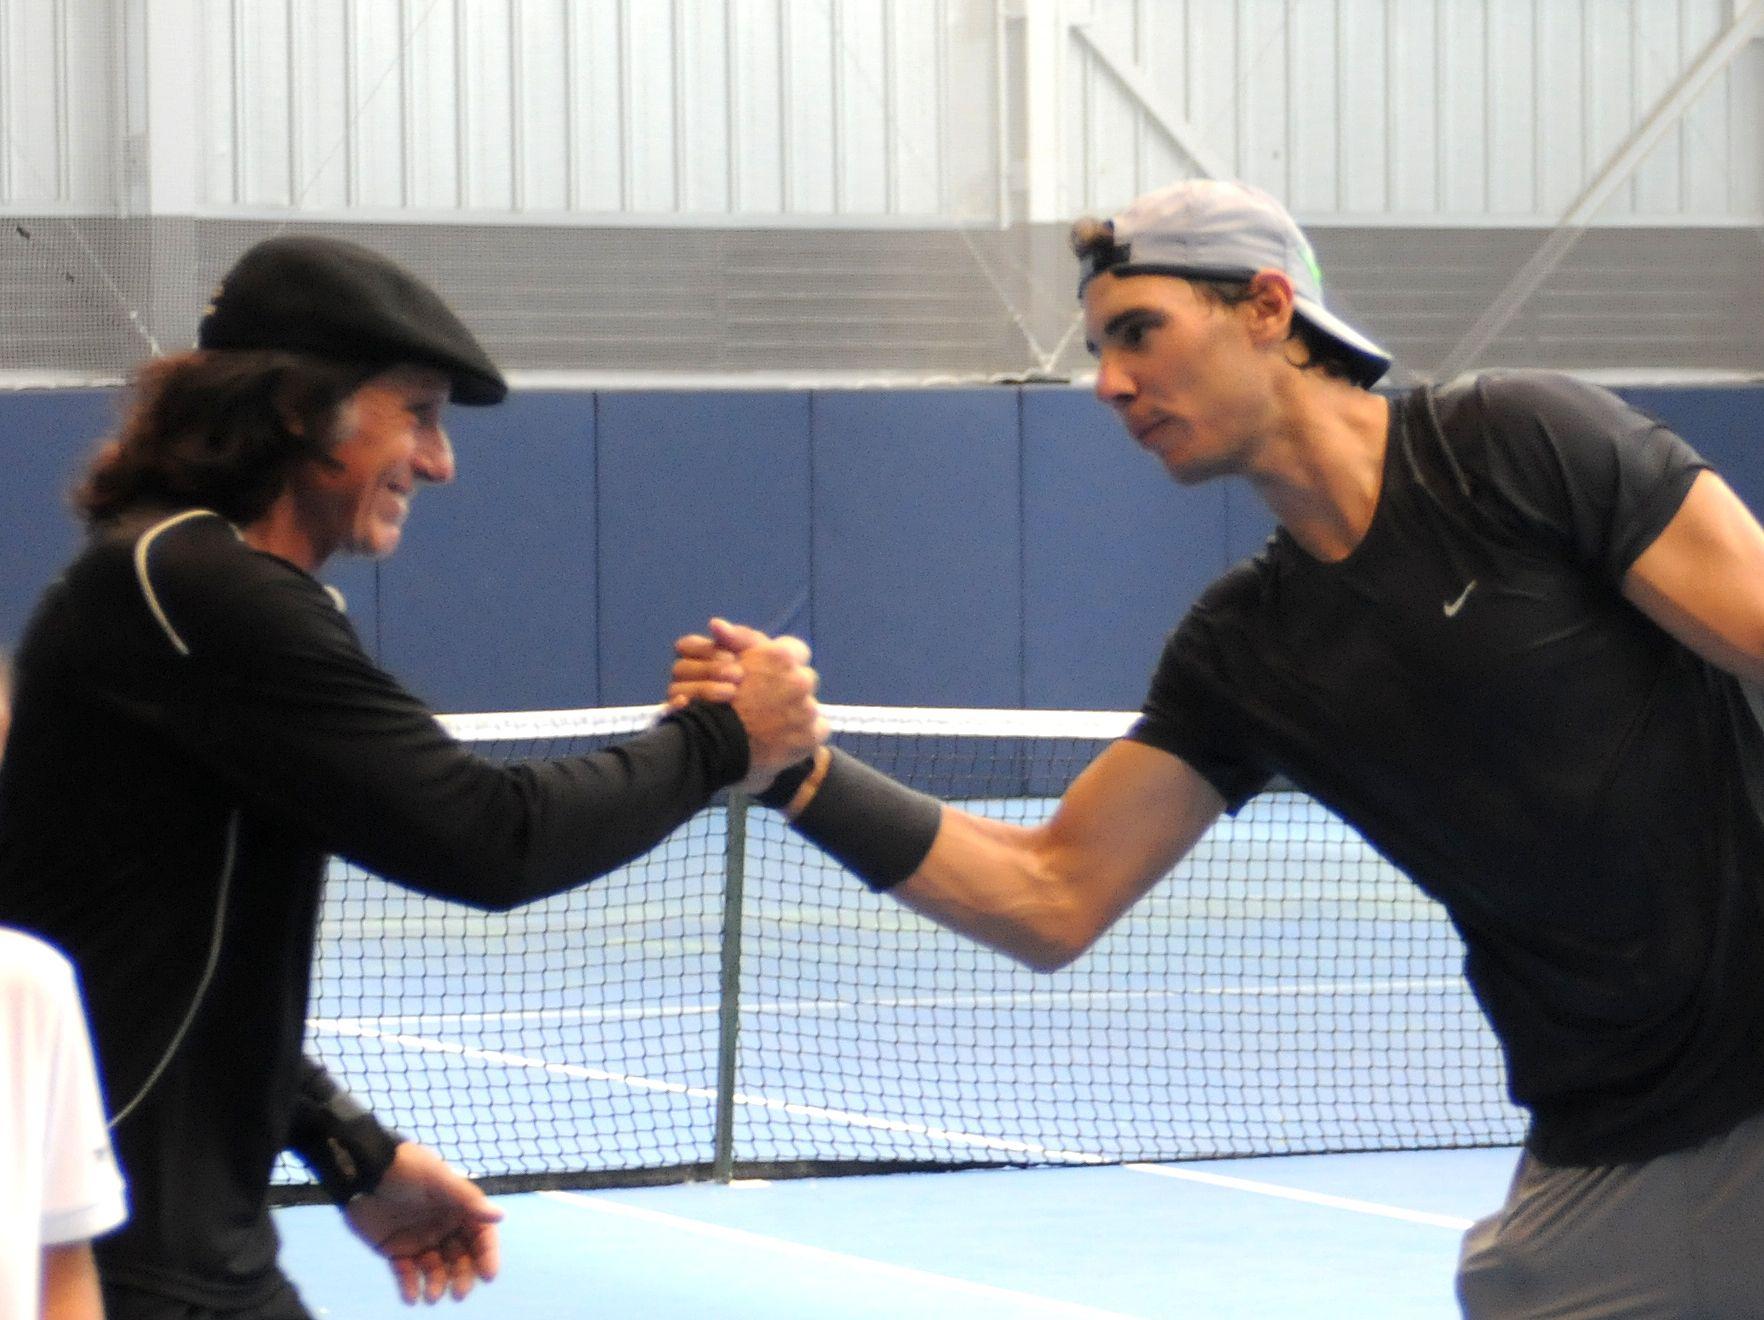 Guillermo Vilas se quedó sin récord, pero igual felicitó a Rafa Nadal